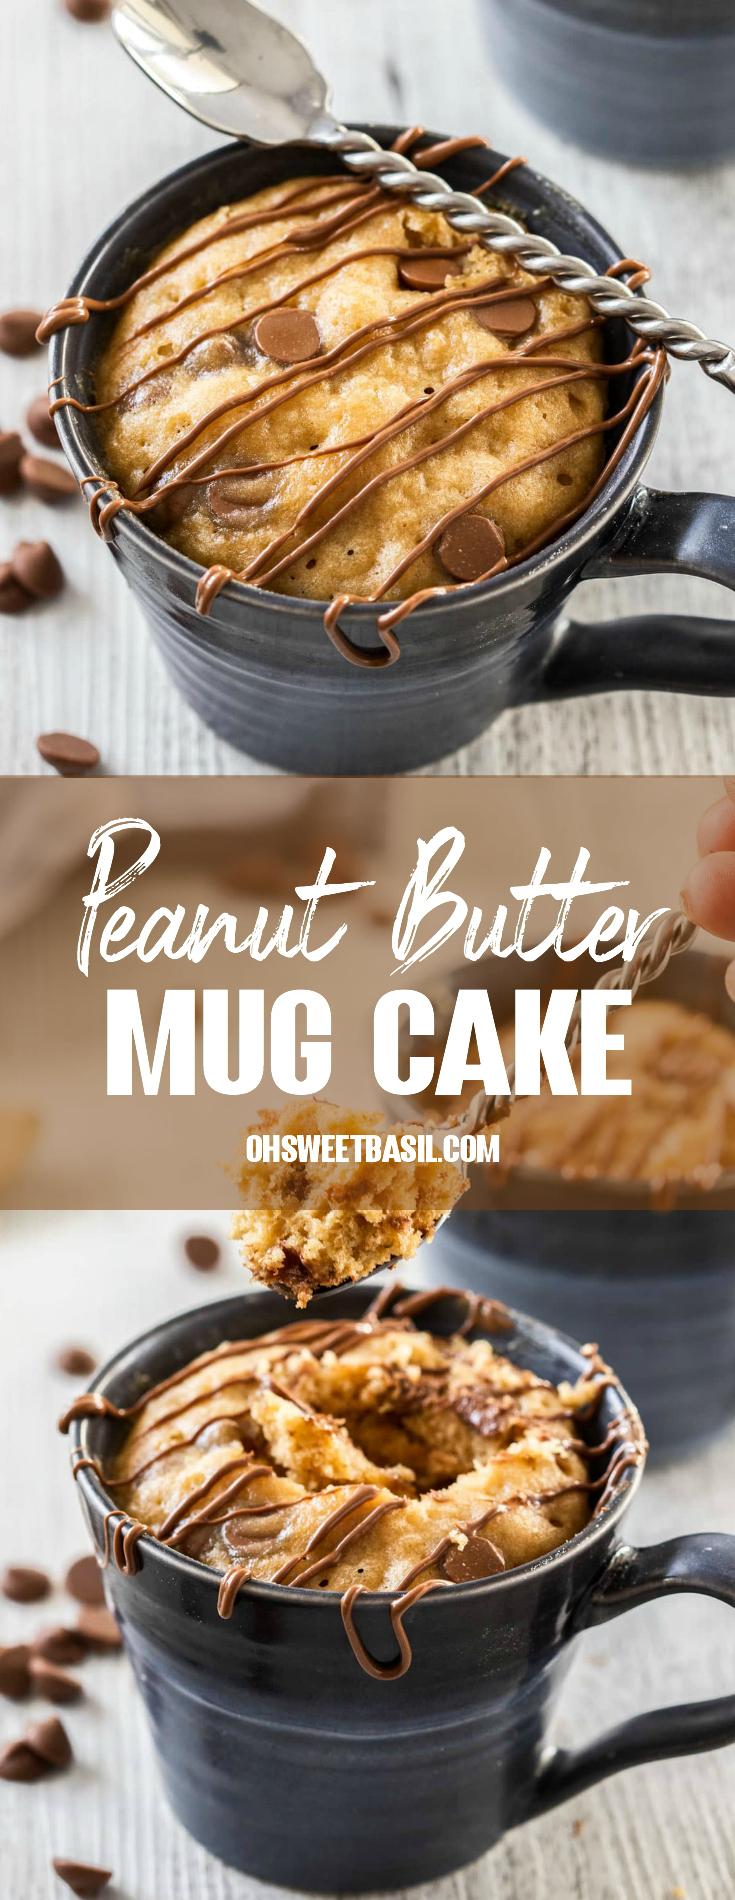 5 Minute Peanut Butter Mug Cake Recipe Oh Sweet Basil